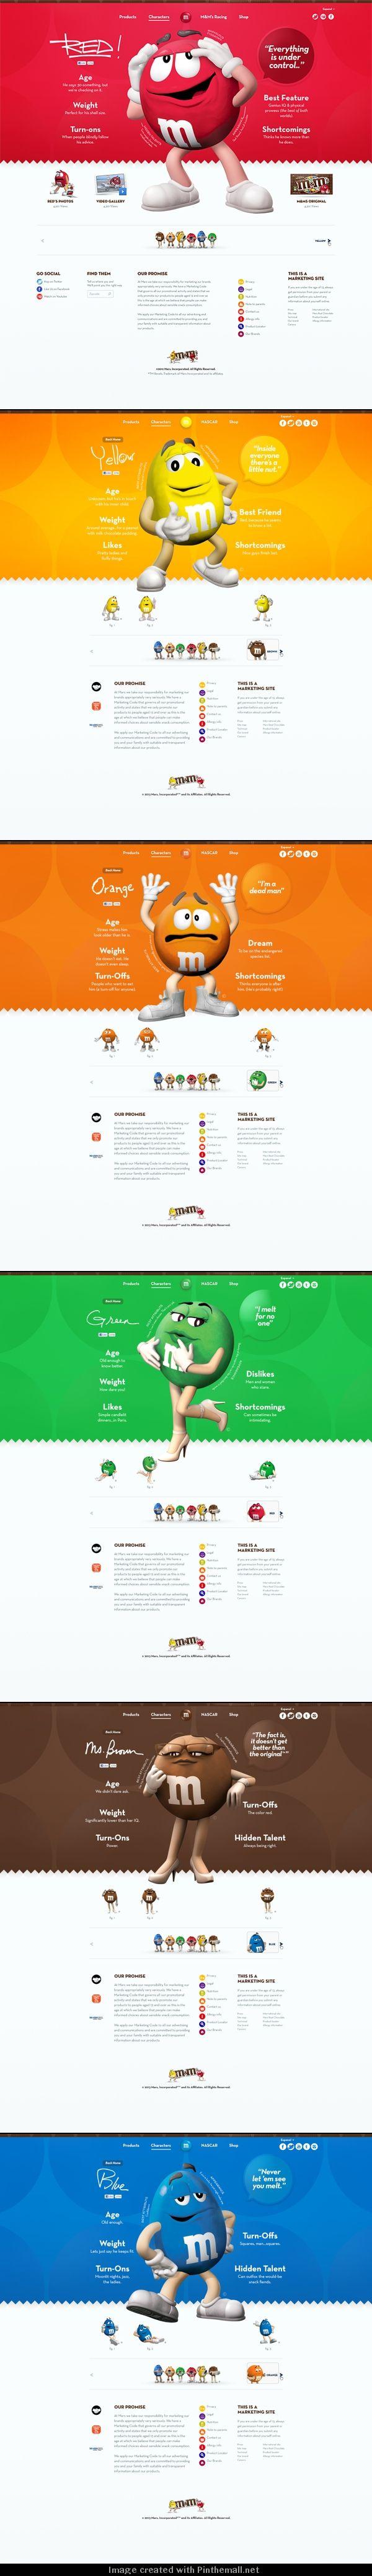 Cool Web Design on the Internet, M&M. #webdesign #webdevelopment #website